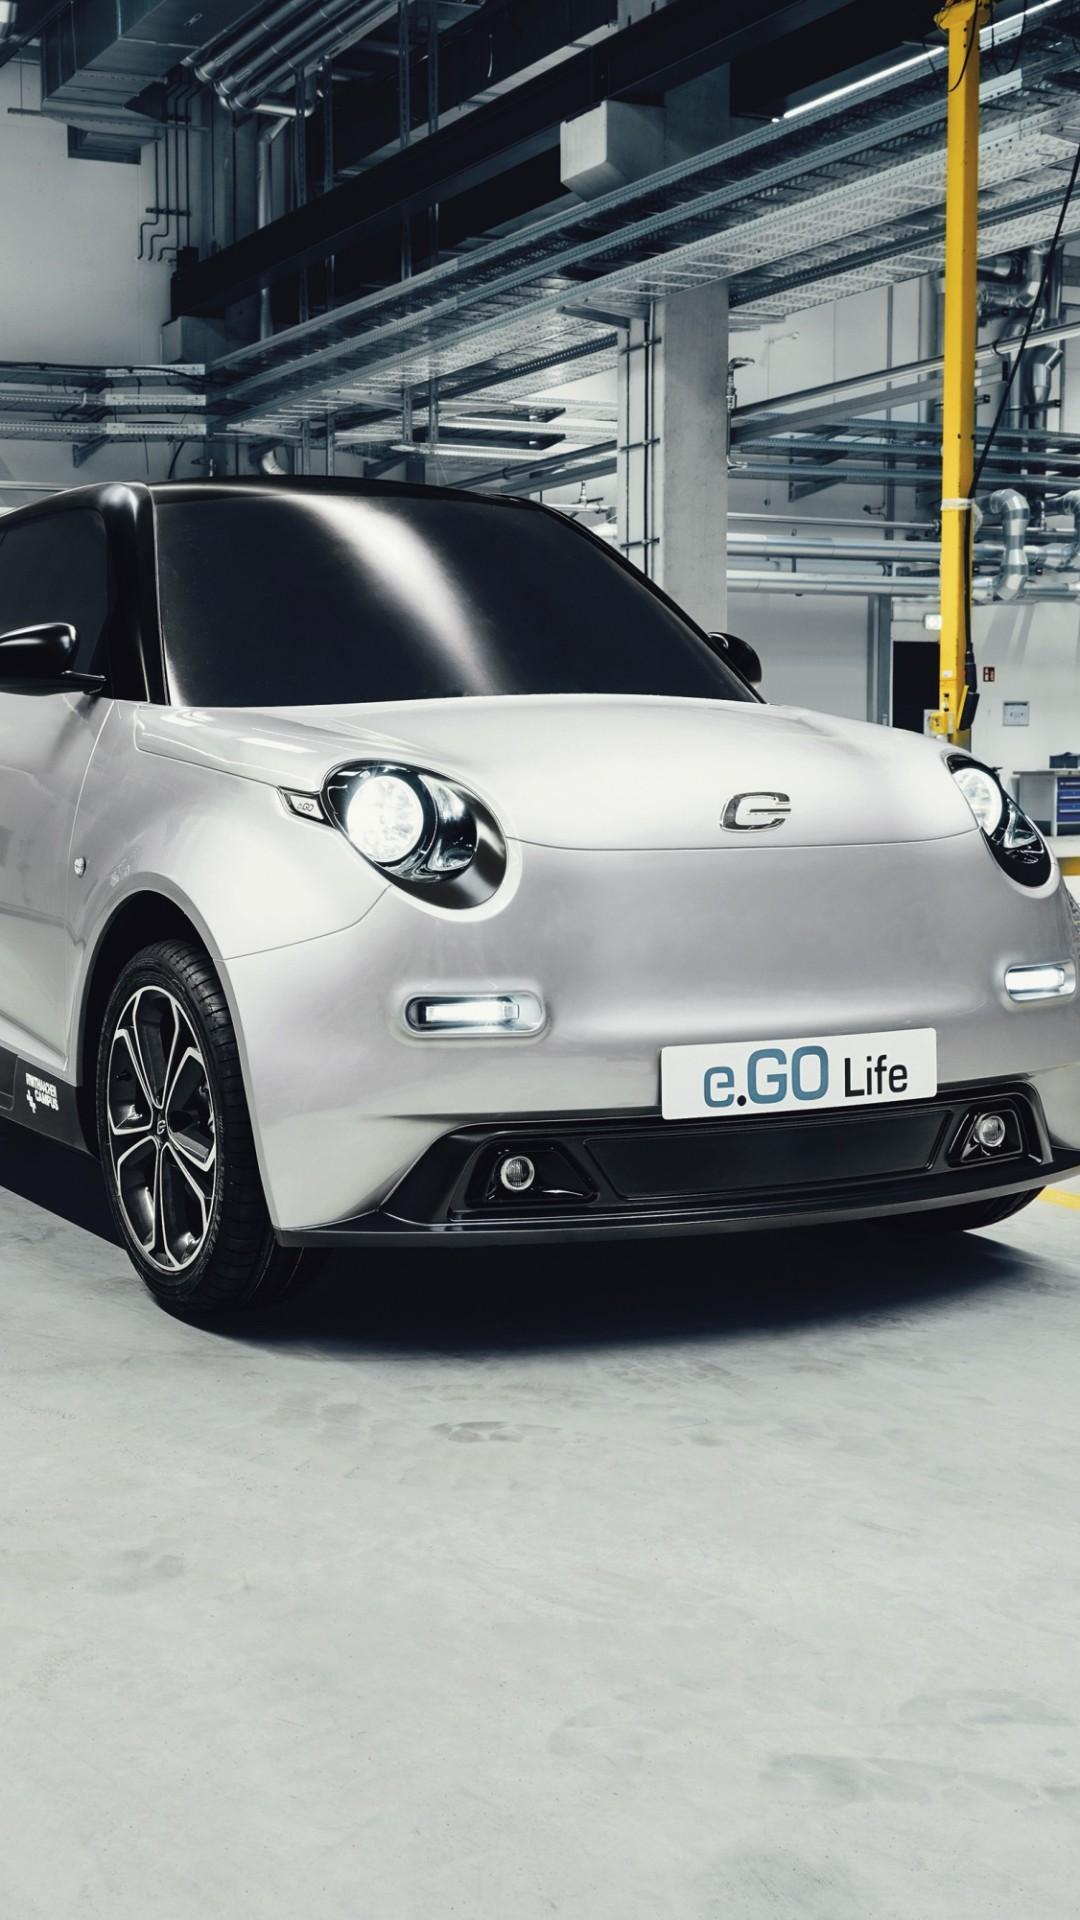 Wallpaper e.GO Life, electric cars, concept, eco friendly ...